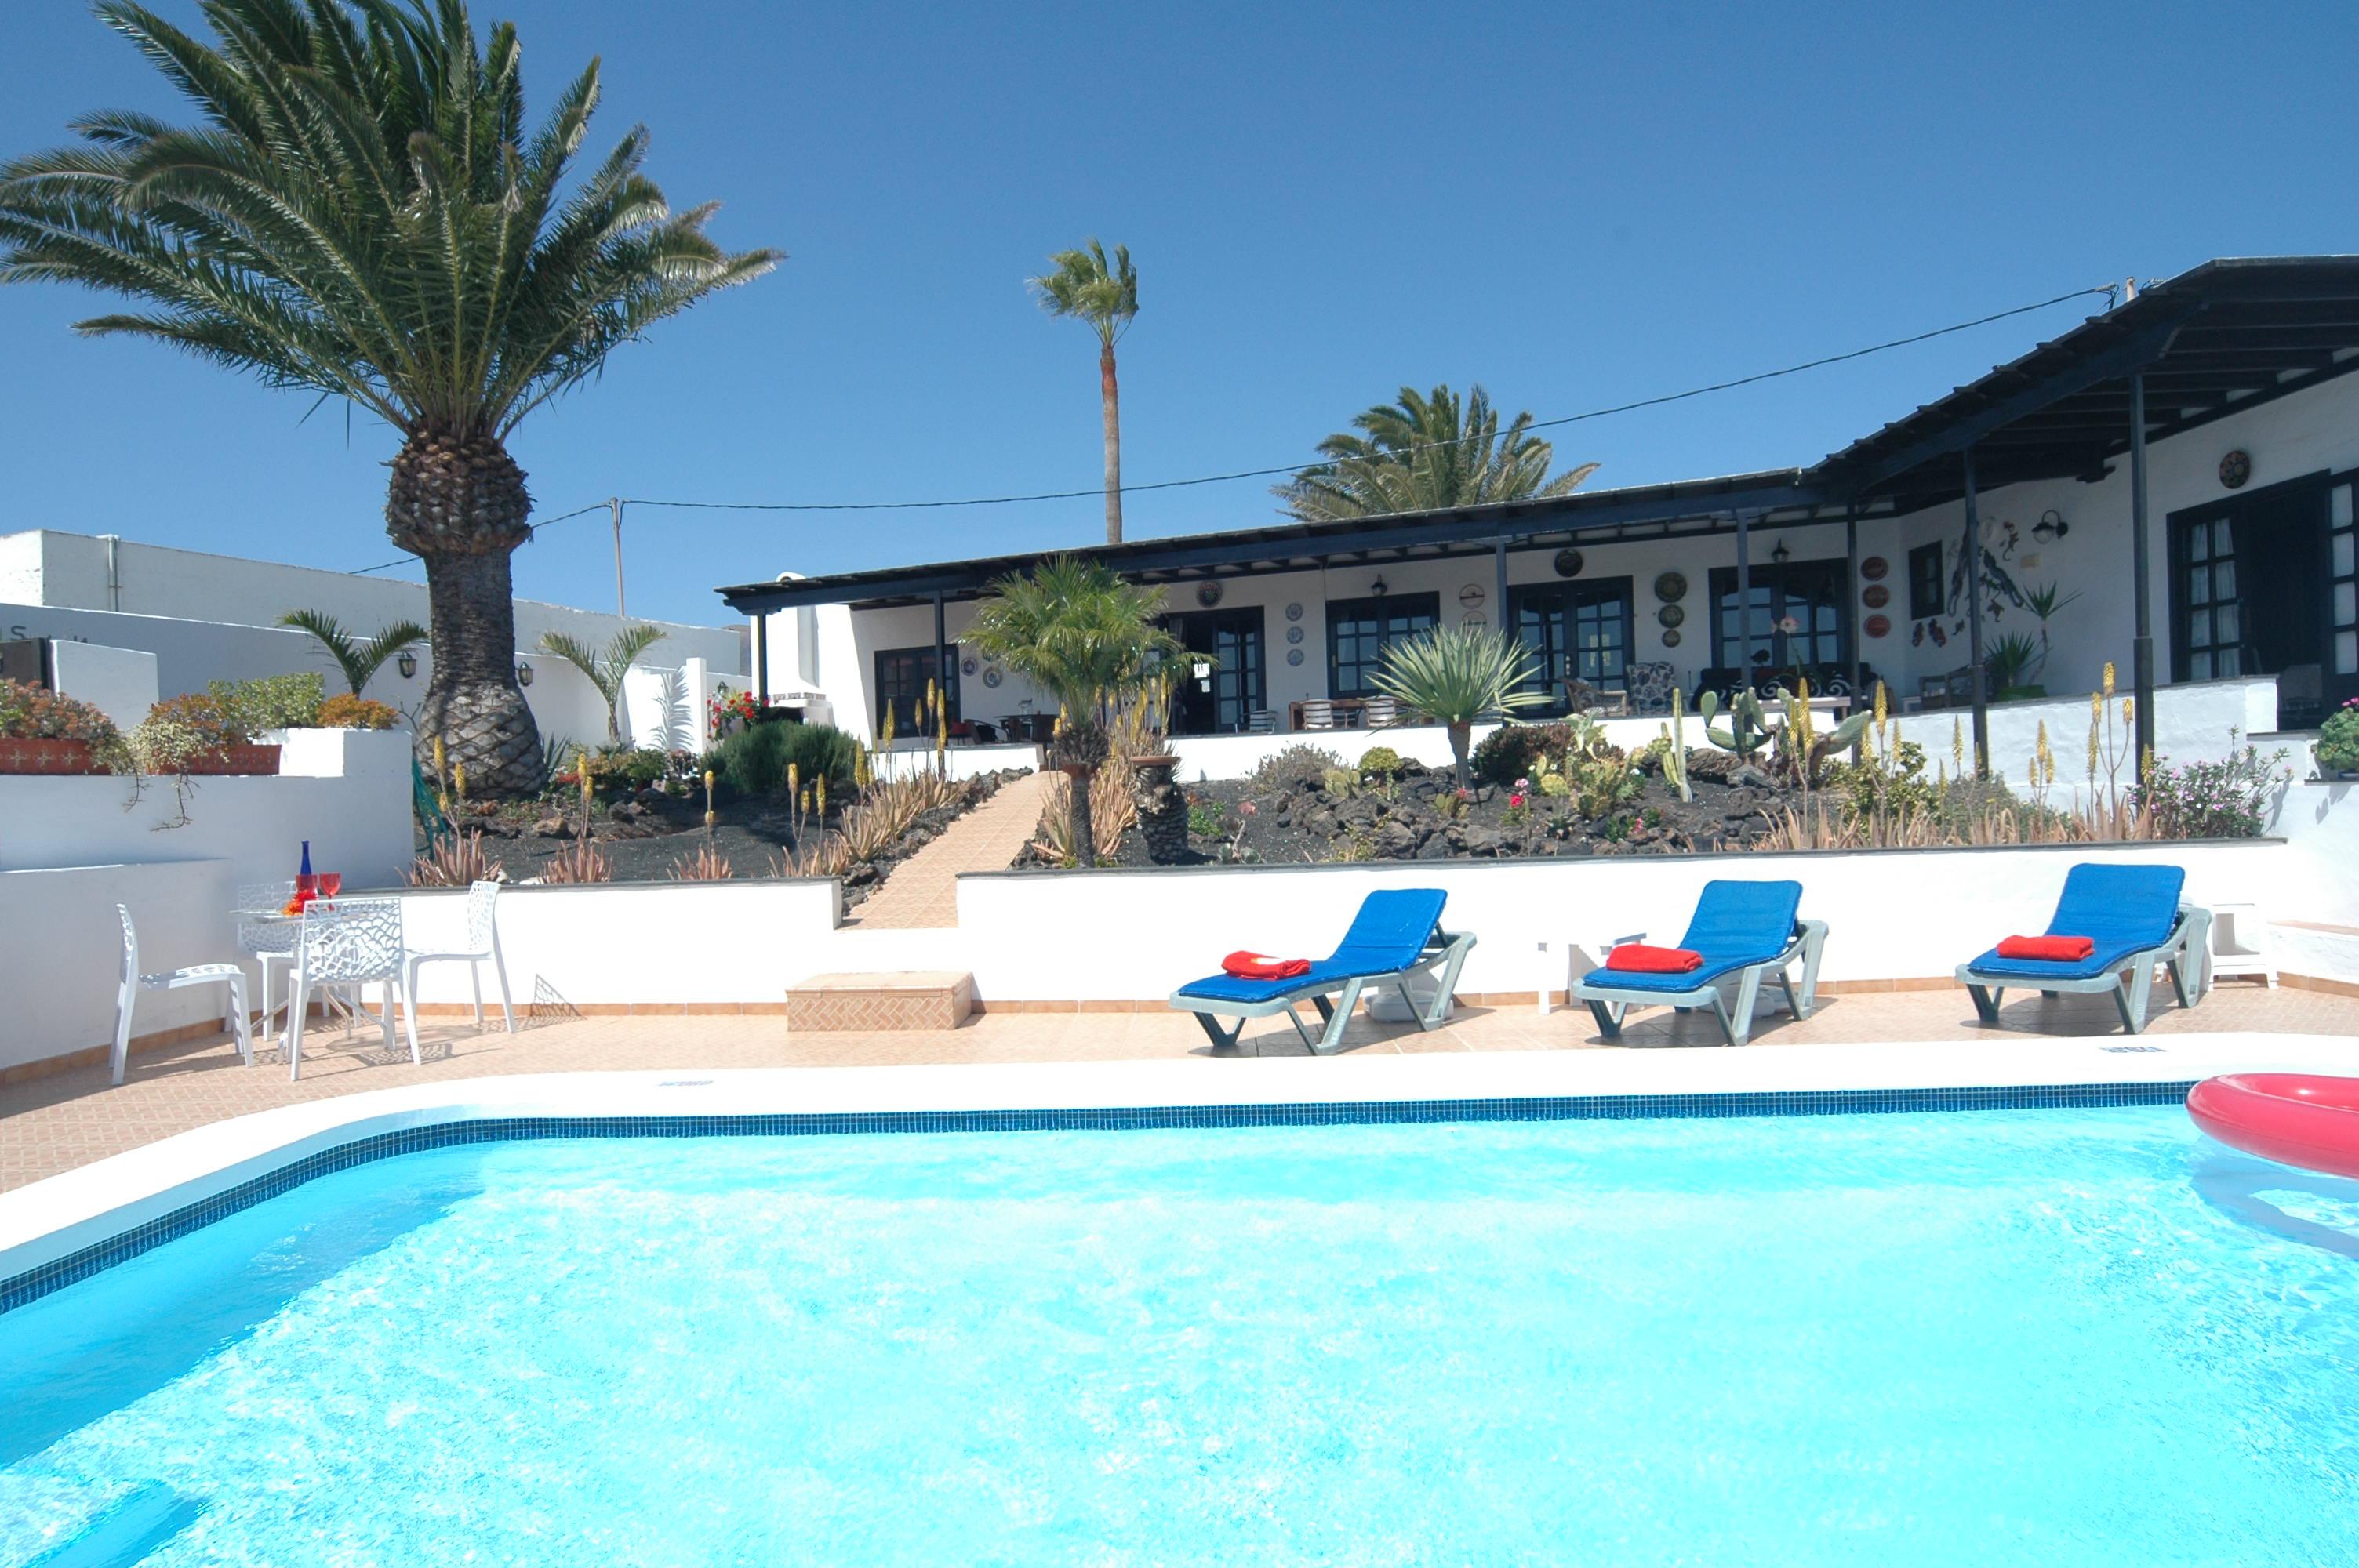 LVC198622 sunbathing by the pool